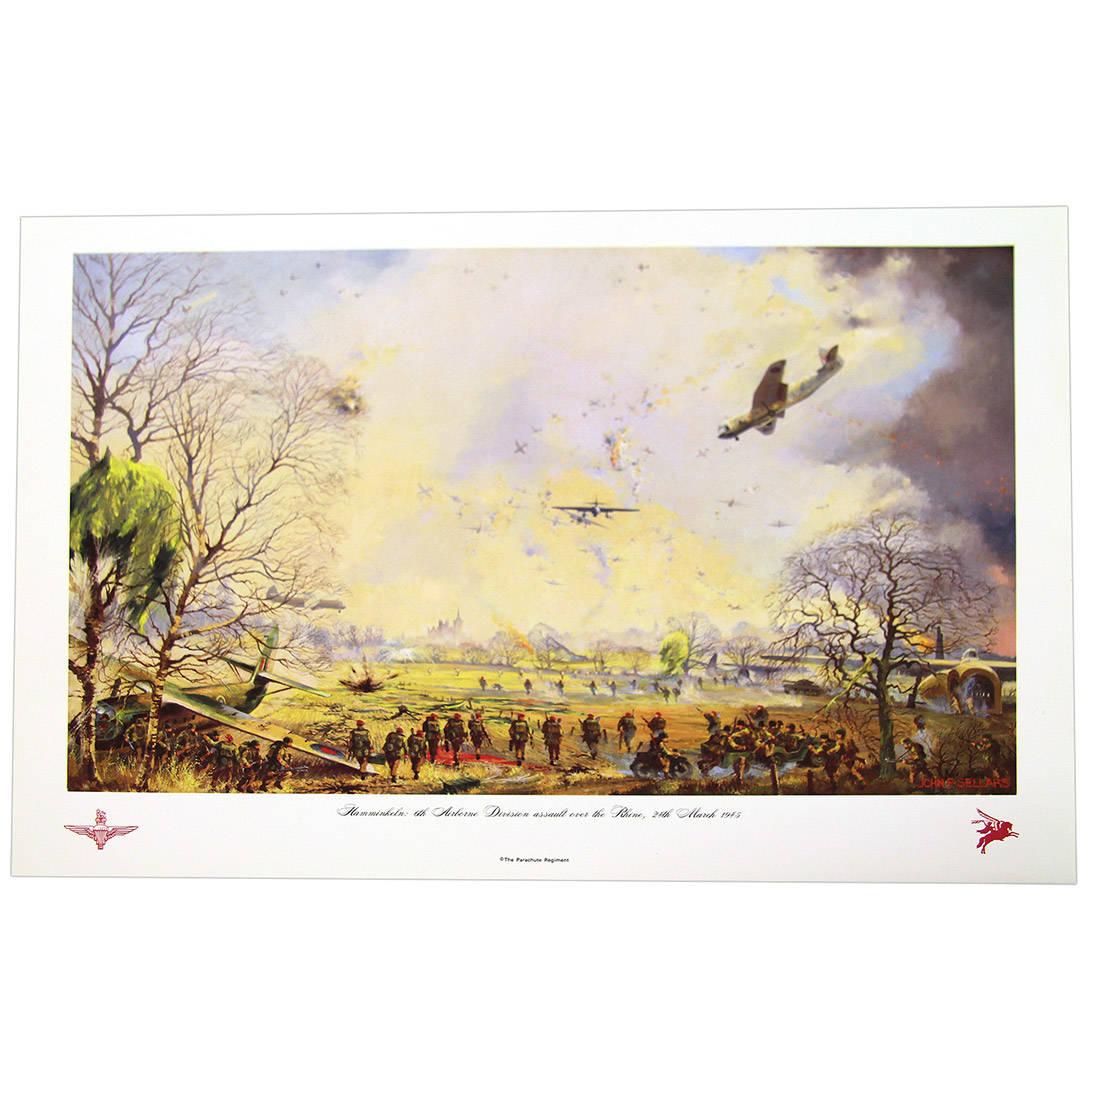 Hamminkeln 6th Airborne Div. Assault Over The Rhine 24th March 1945 by John Sellars (Print)